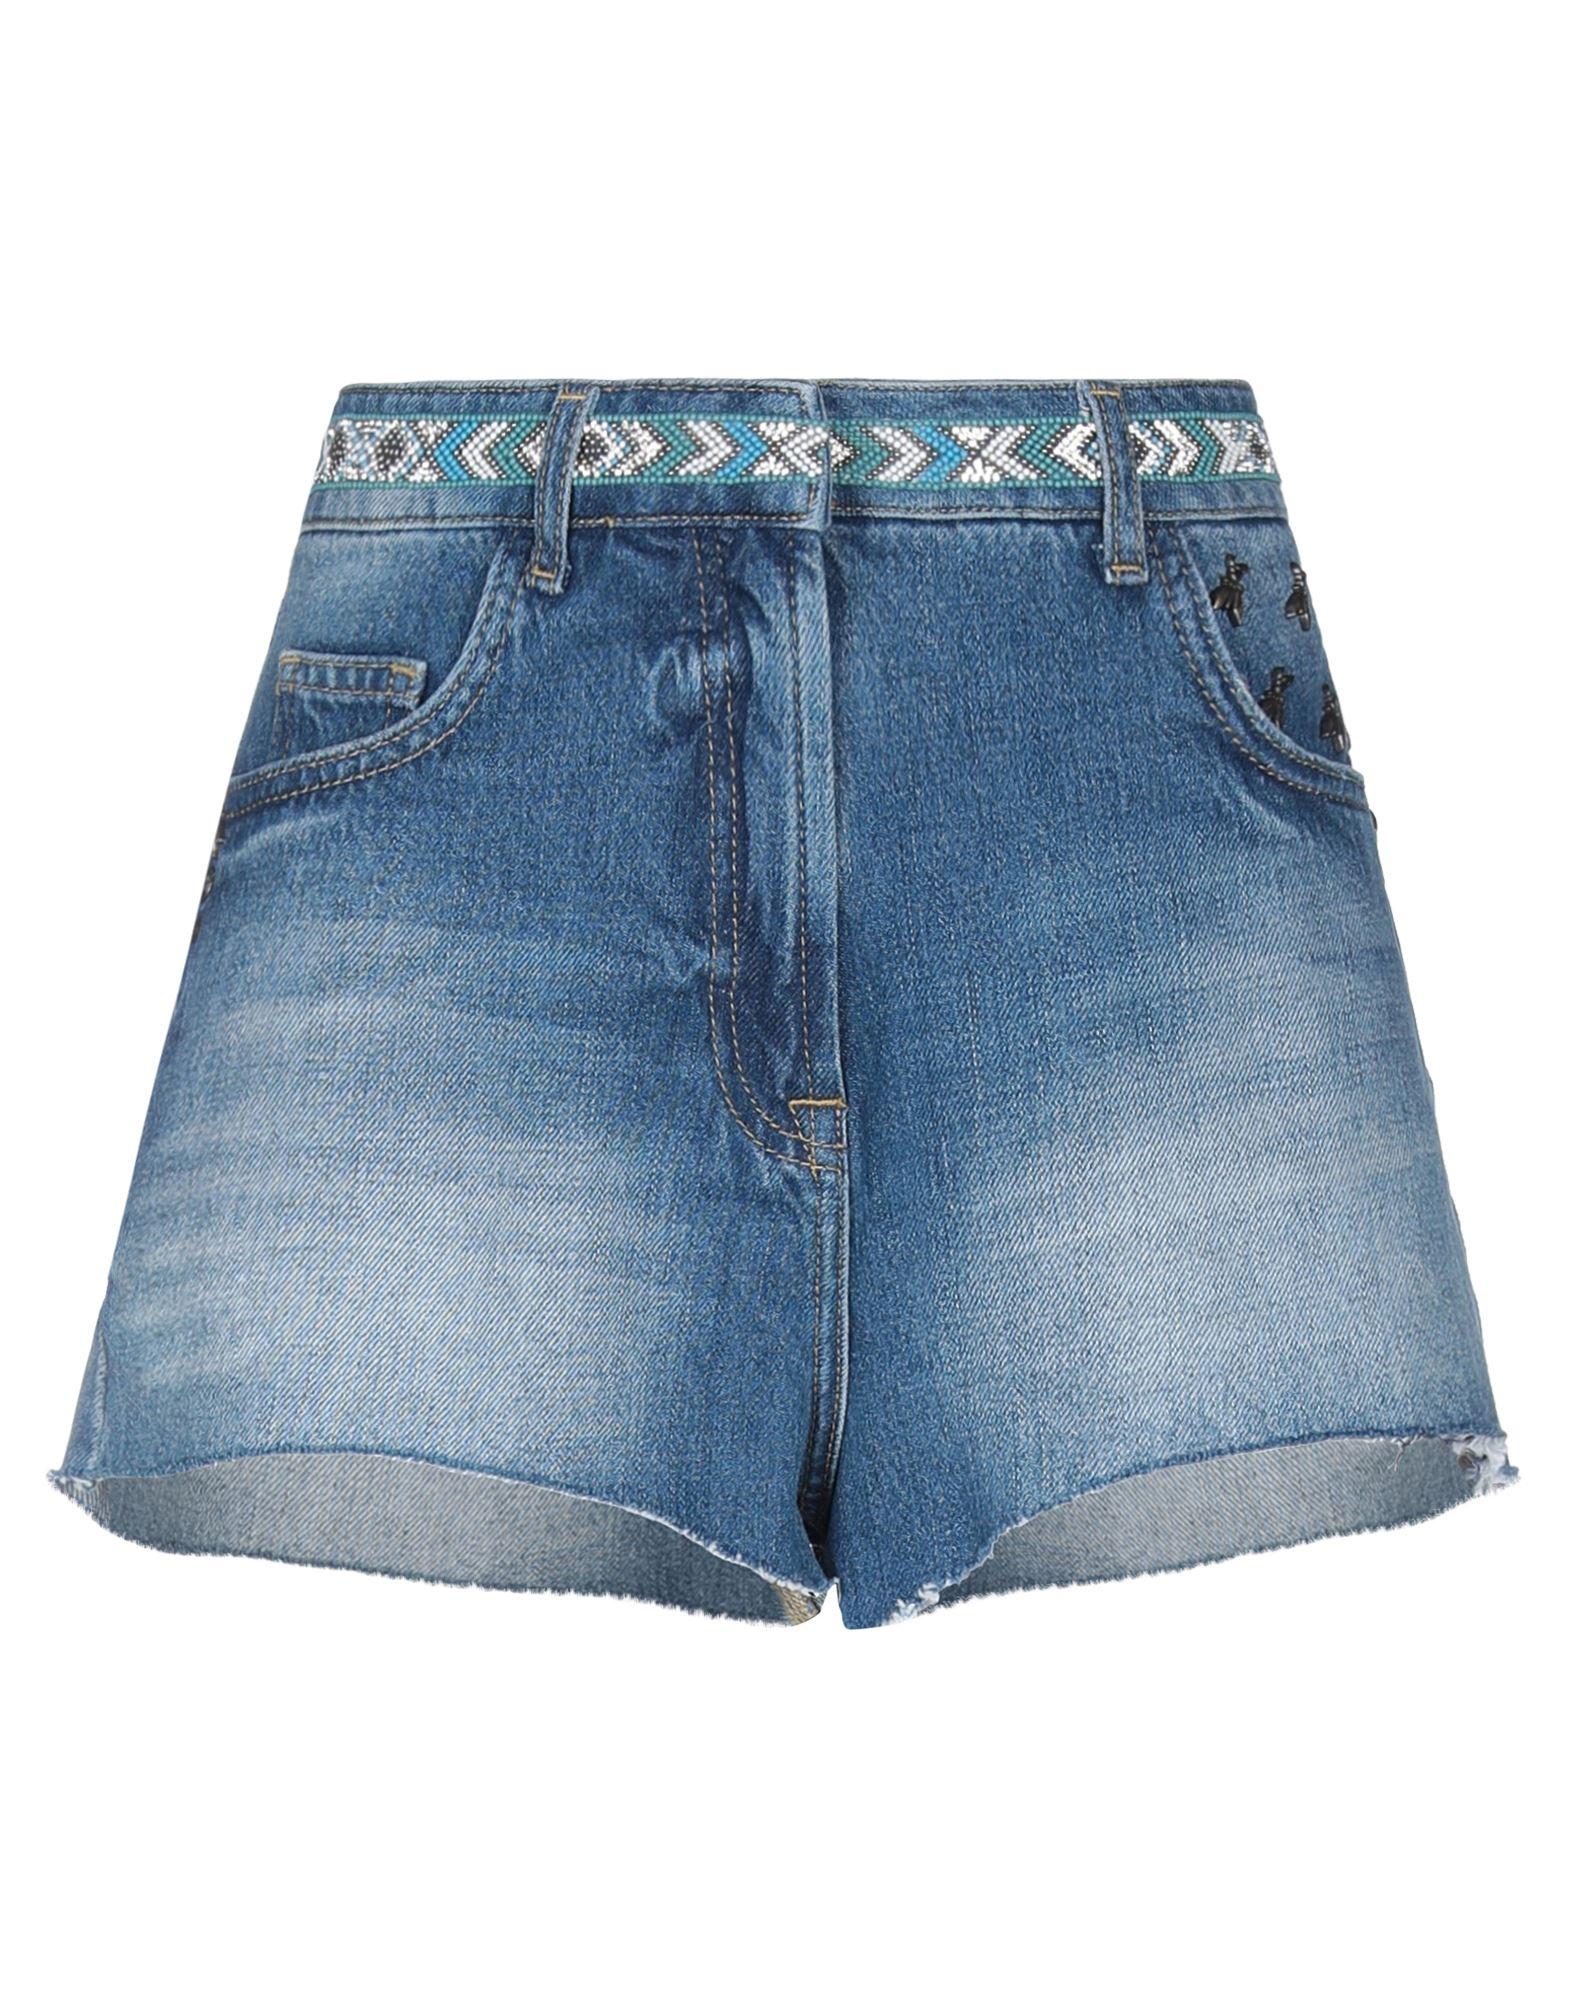 Фото - PATRIZIA PEPE Джинсовые шорты please джинсовые шорты